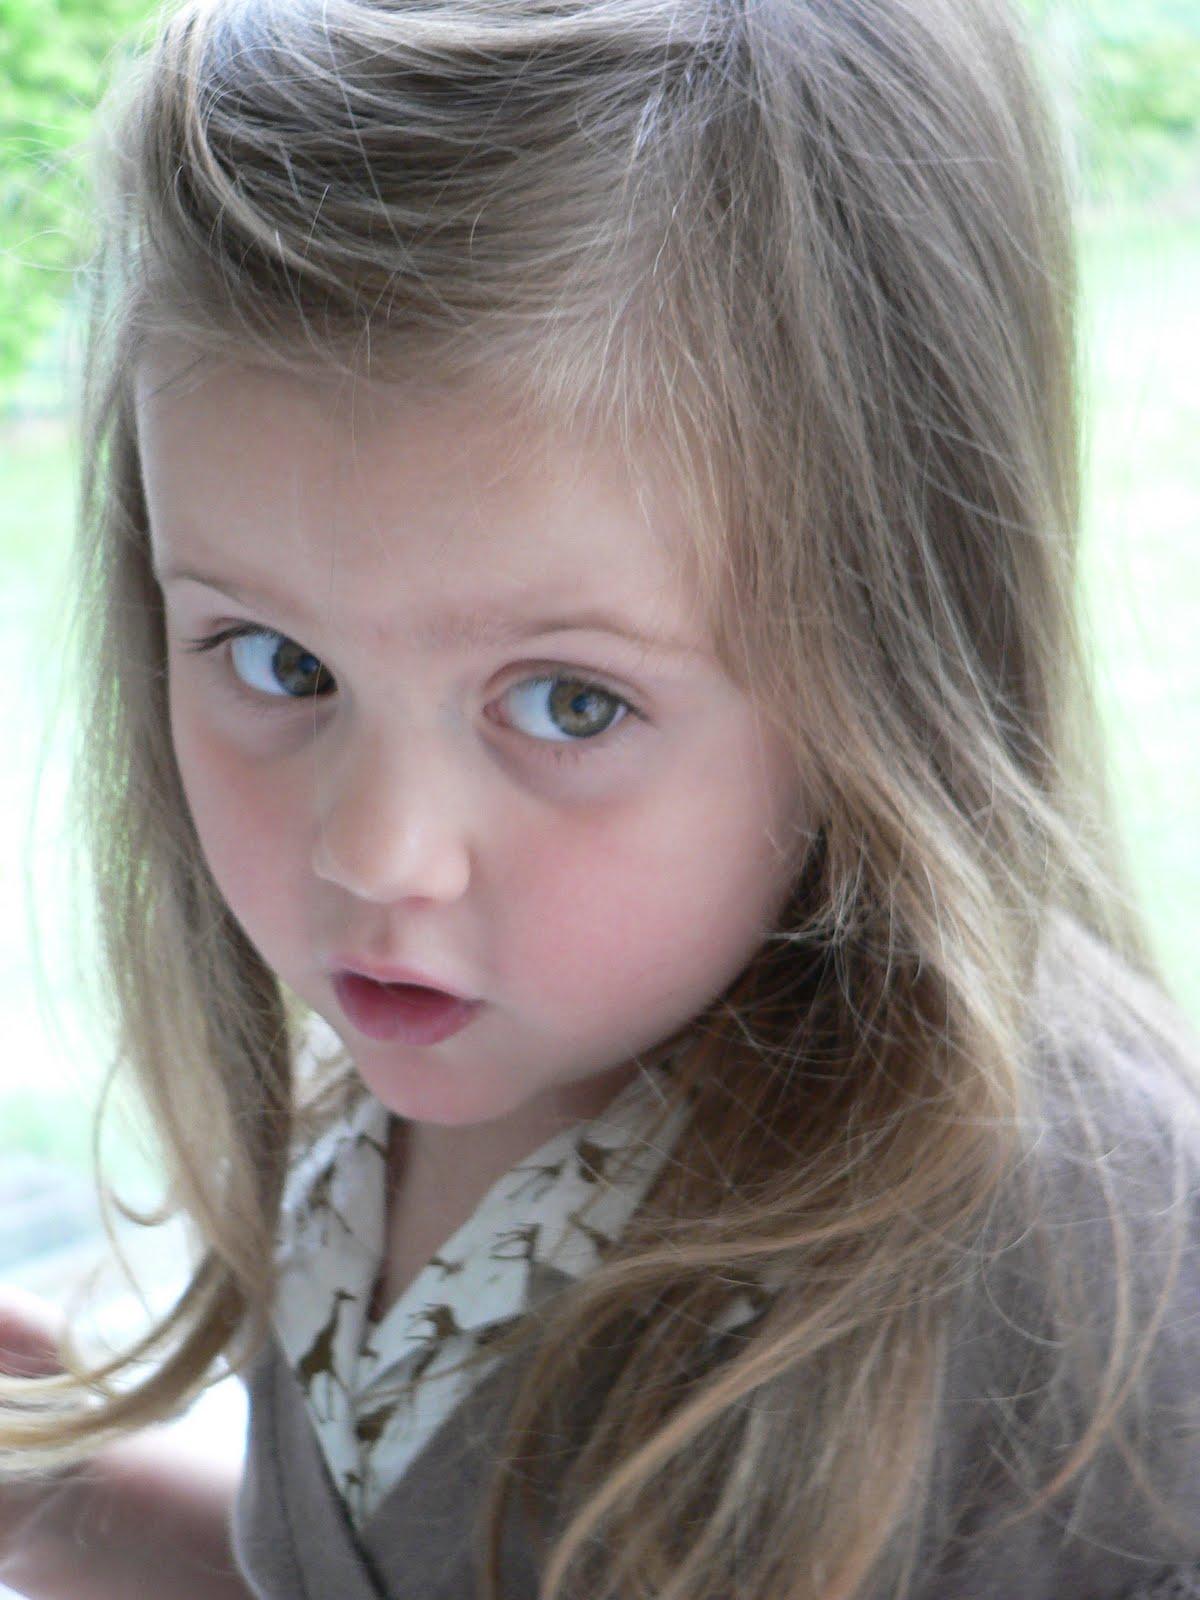 Mie flavie jump rope dress oliver s in giraffenstofje - Kleurenkamer klein meisje ...